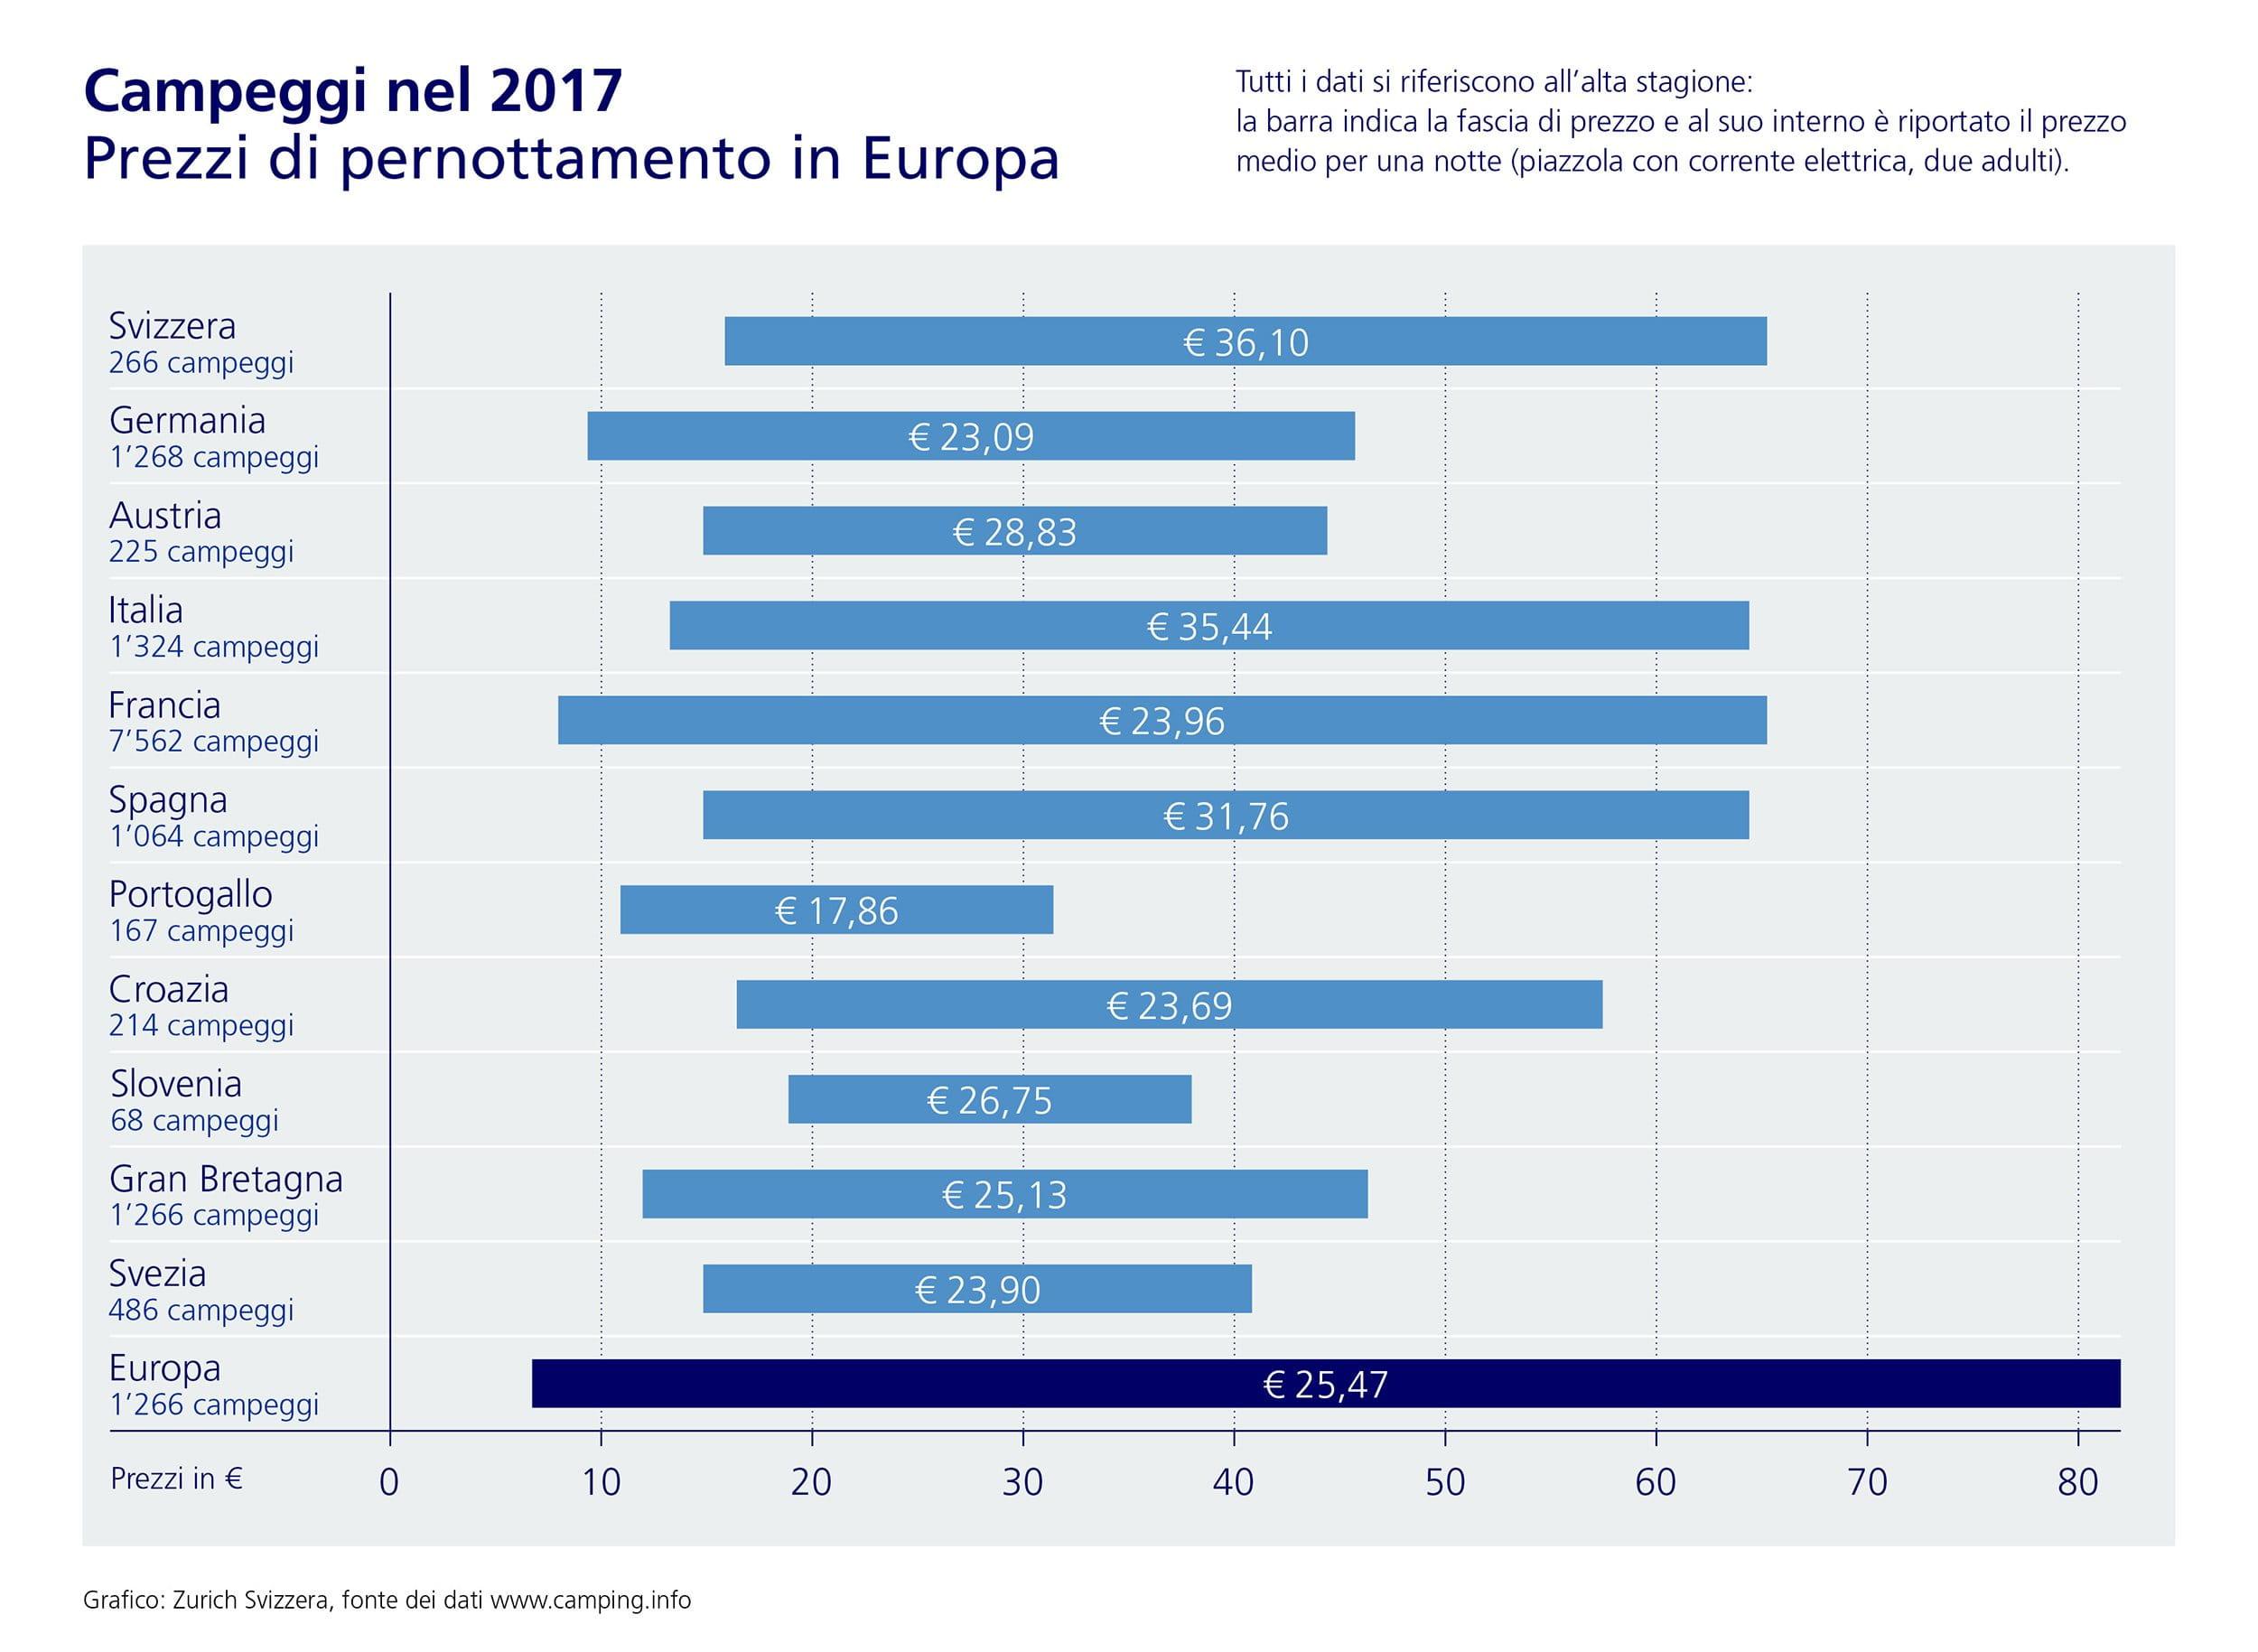 Prezzi in Europa